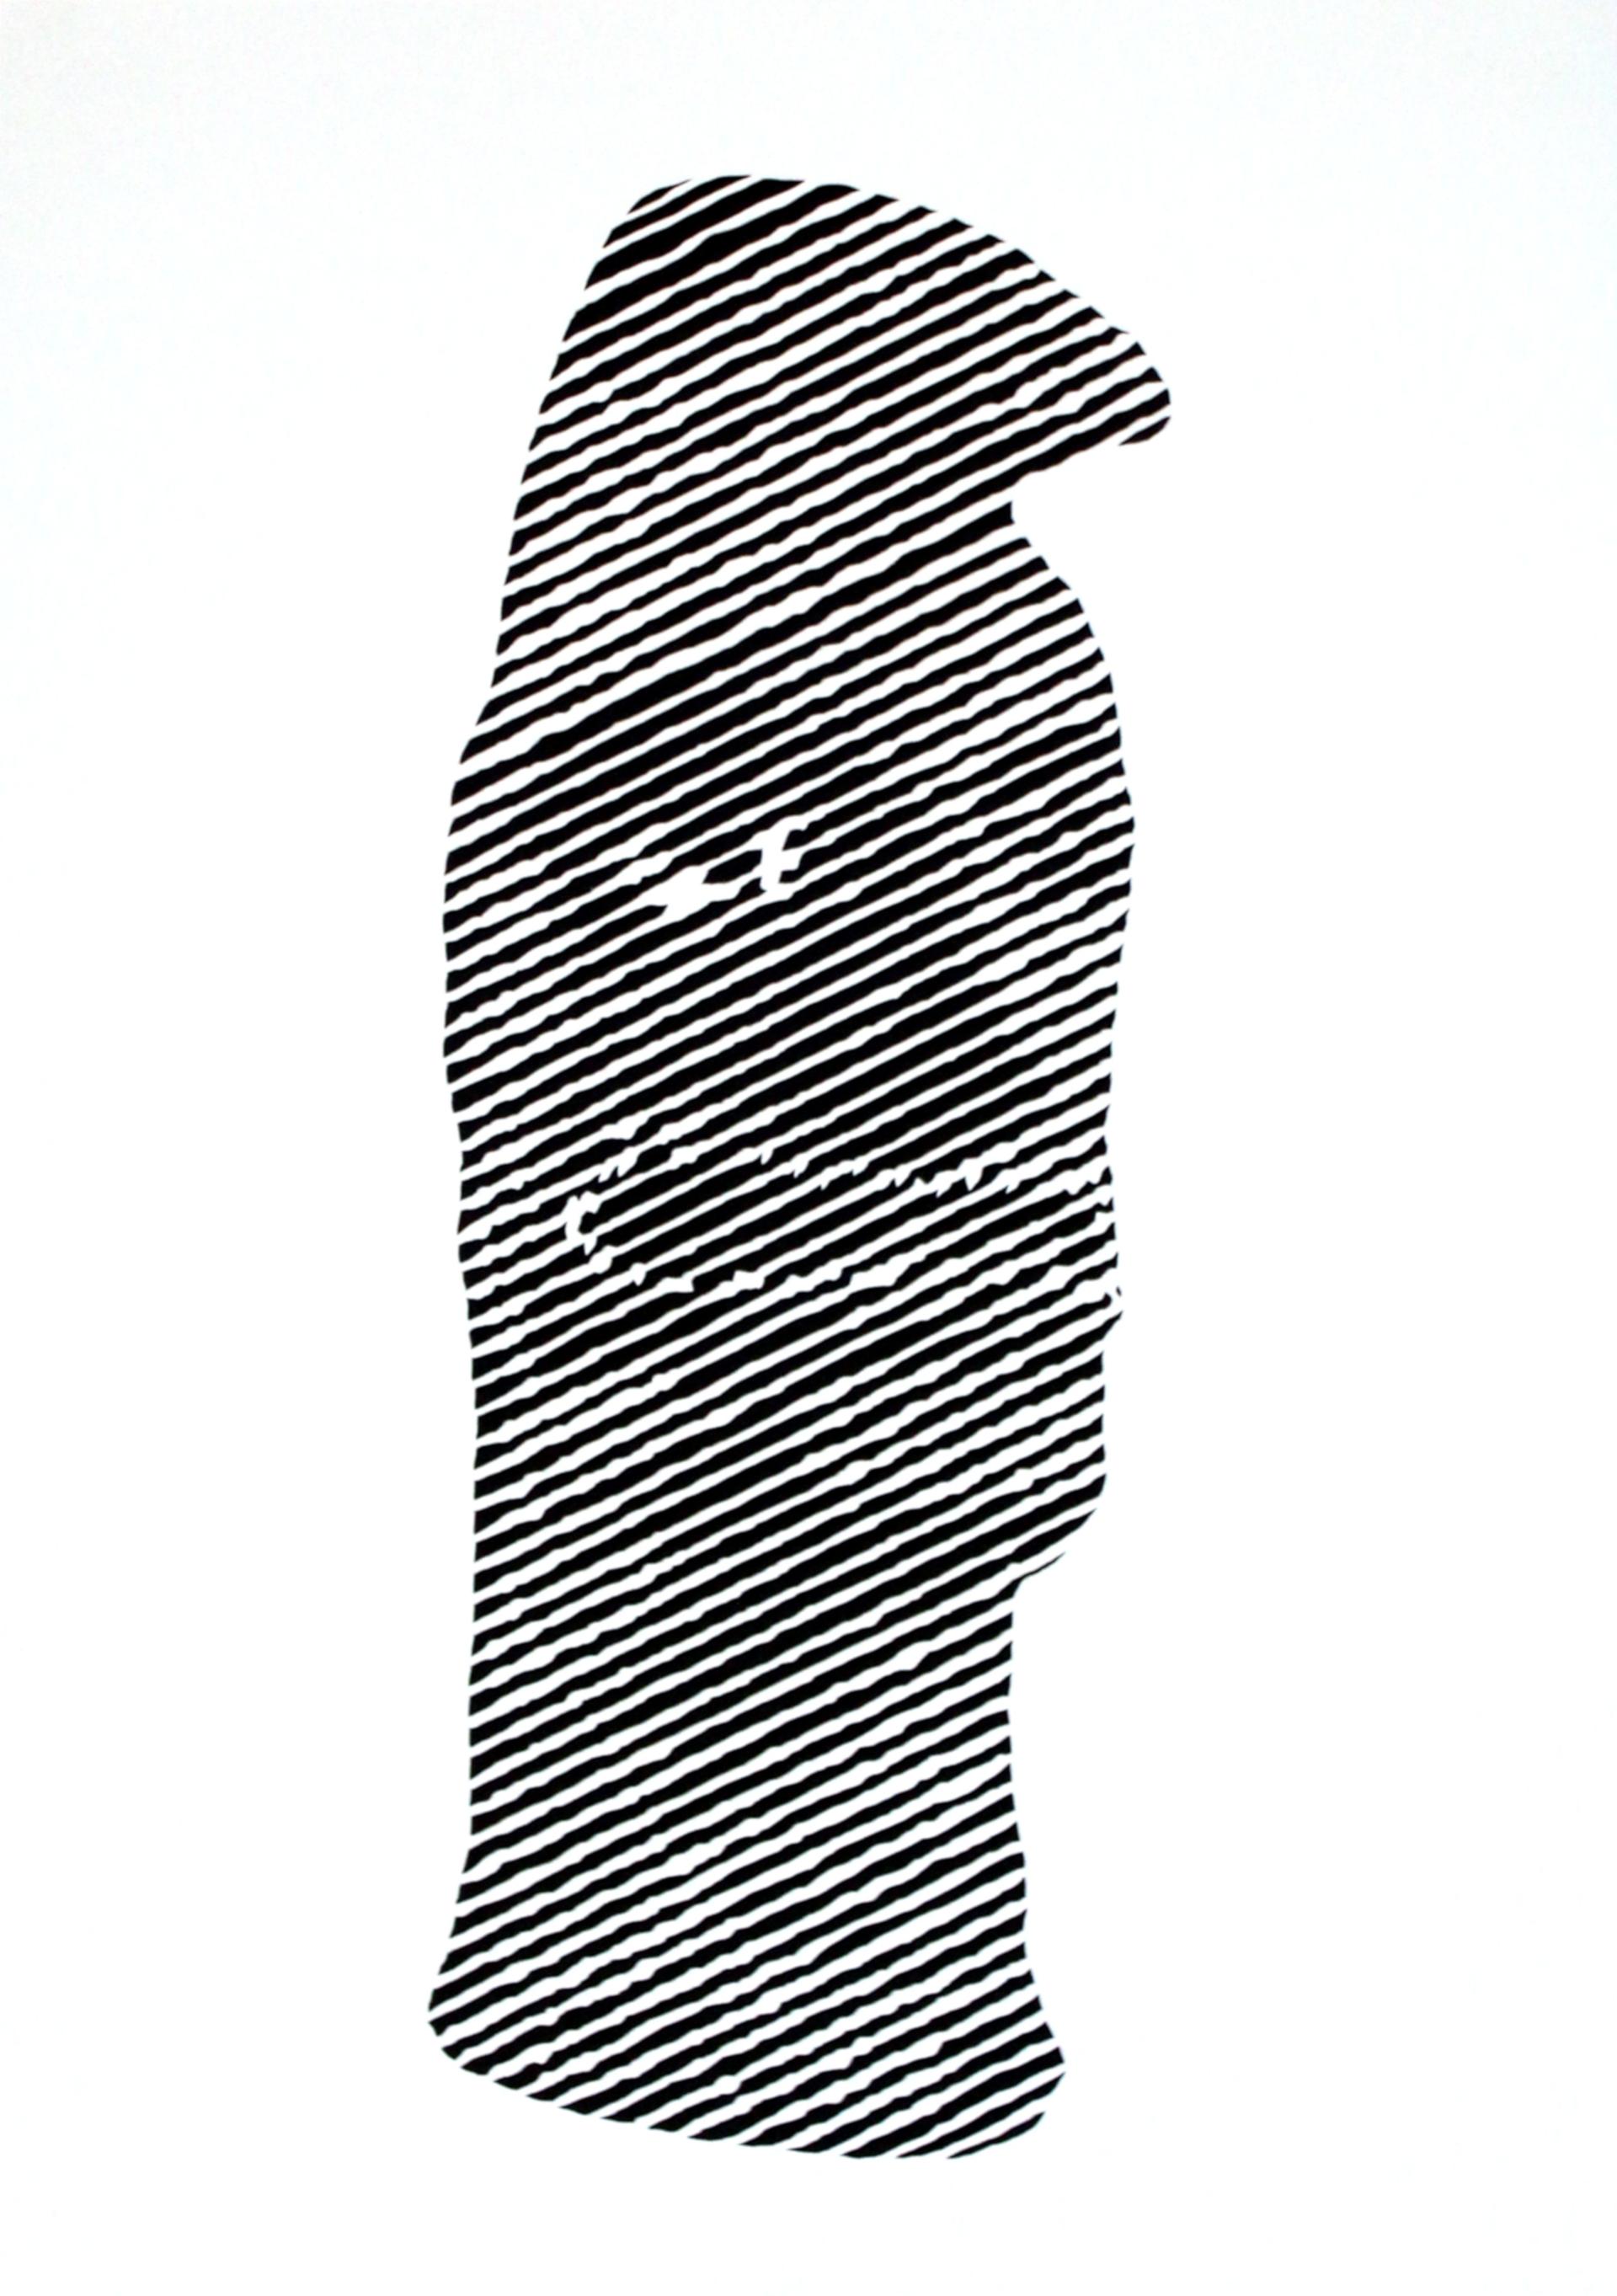 Akua Hulu Manu/Feathered God #1 by Ian Kuali'i